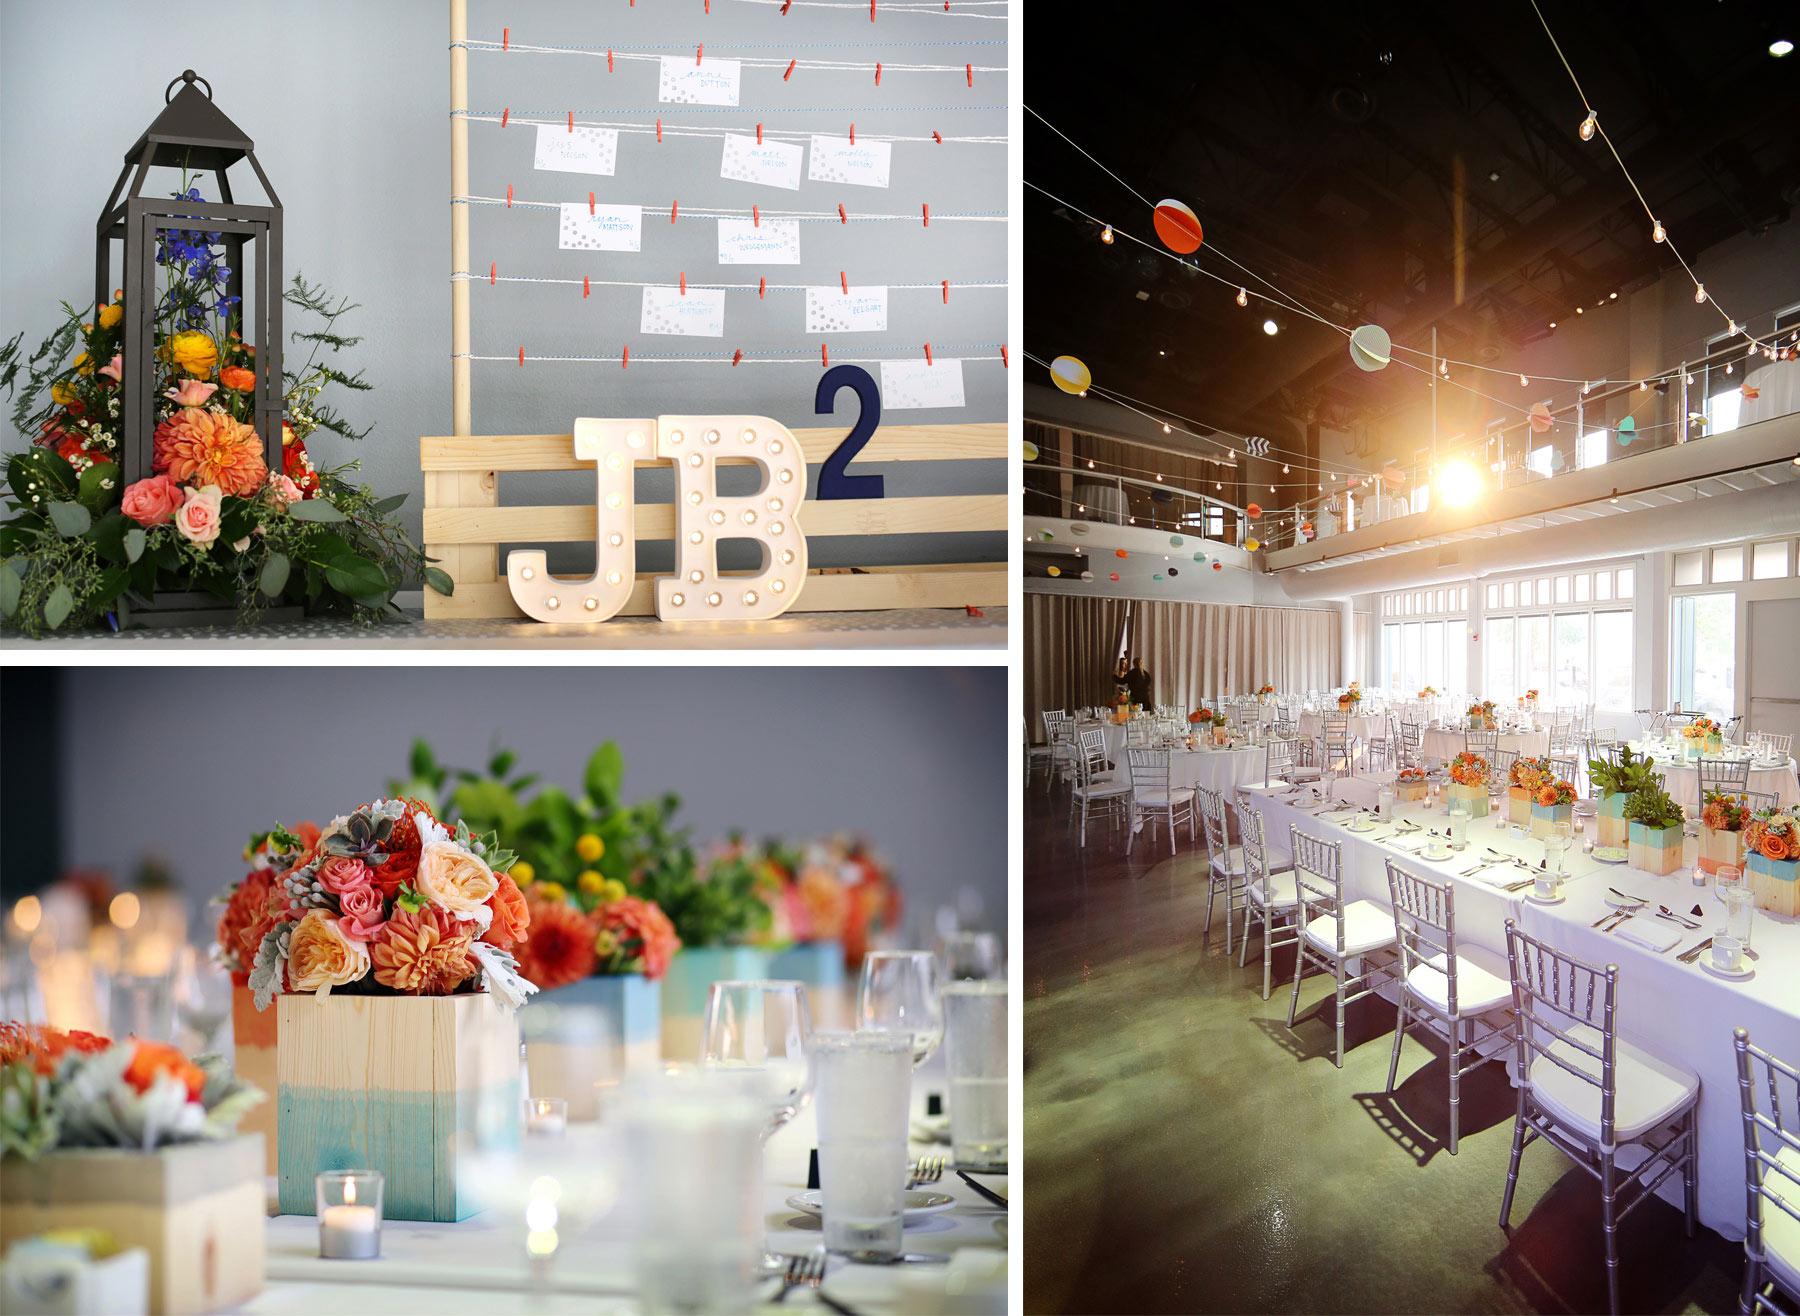 15-Minneapolis-Minnesota-Wedding-Photography-by-Vick-Photography-Muse-Event-Center-Reception-Decor-Jess-&-Jake.jpg